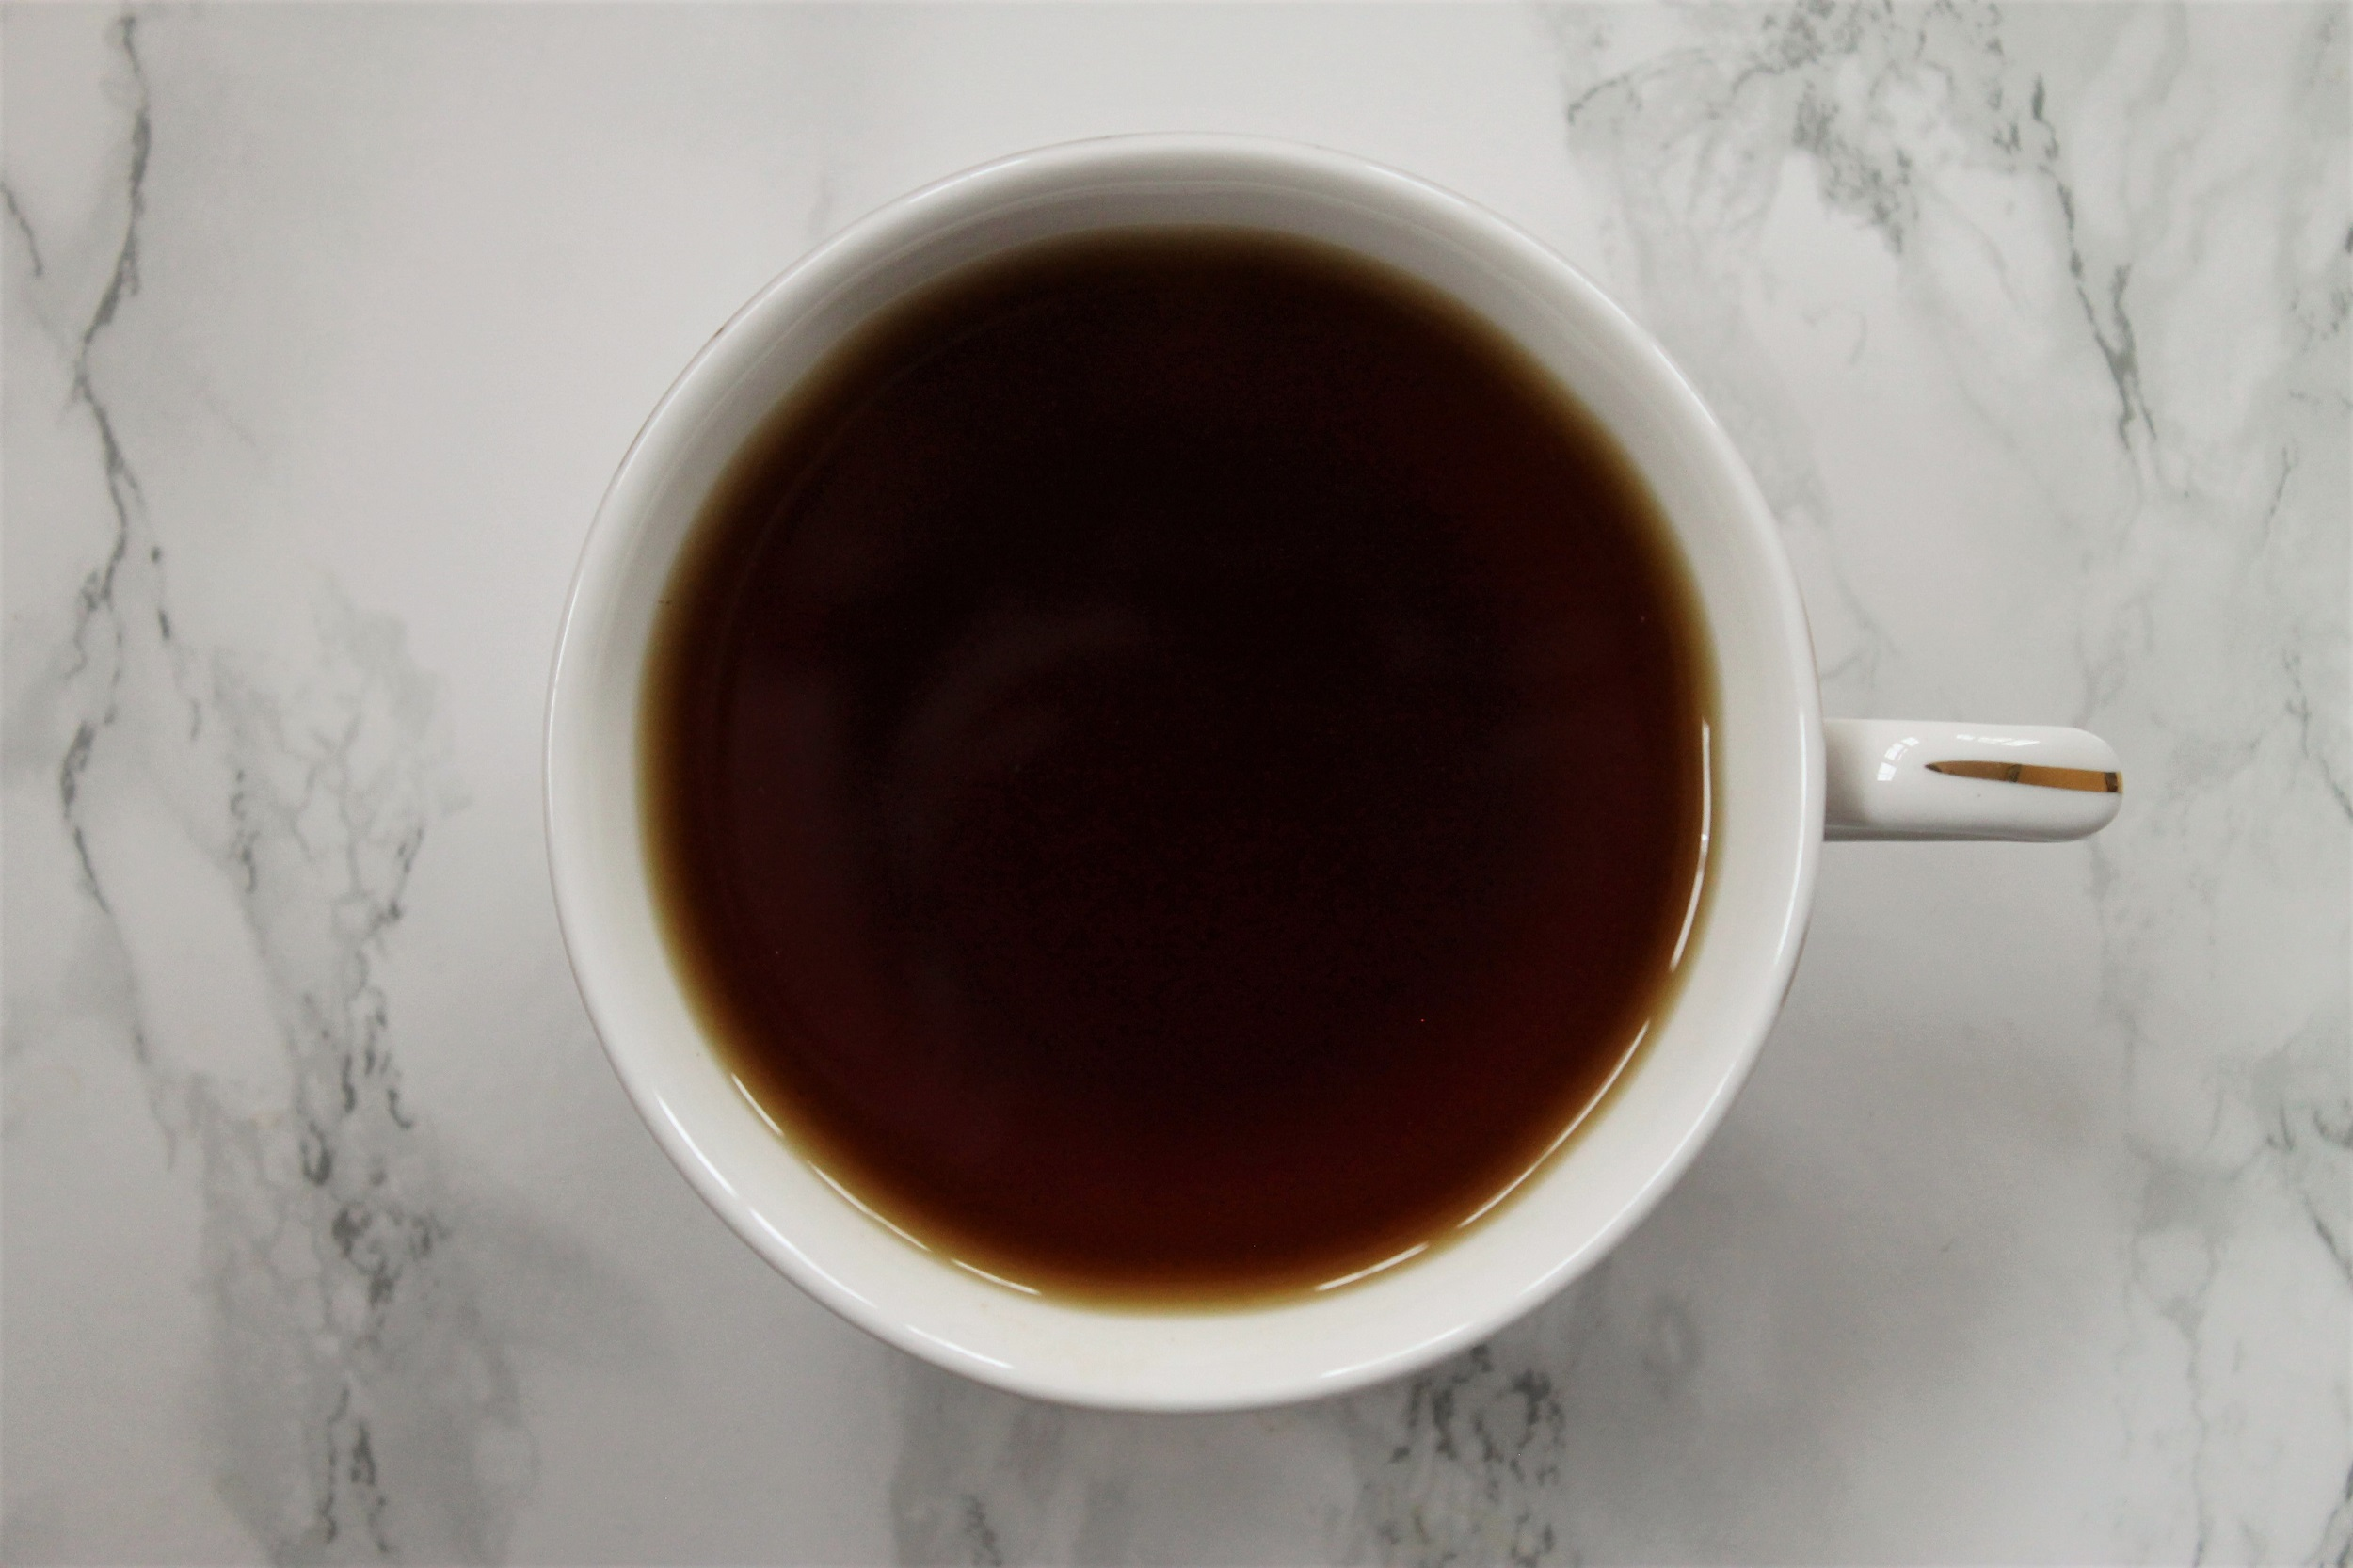 mlesna ceylon black tea in teacup from above